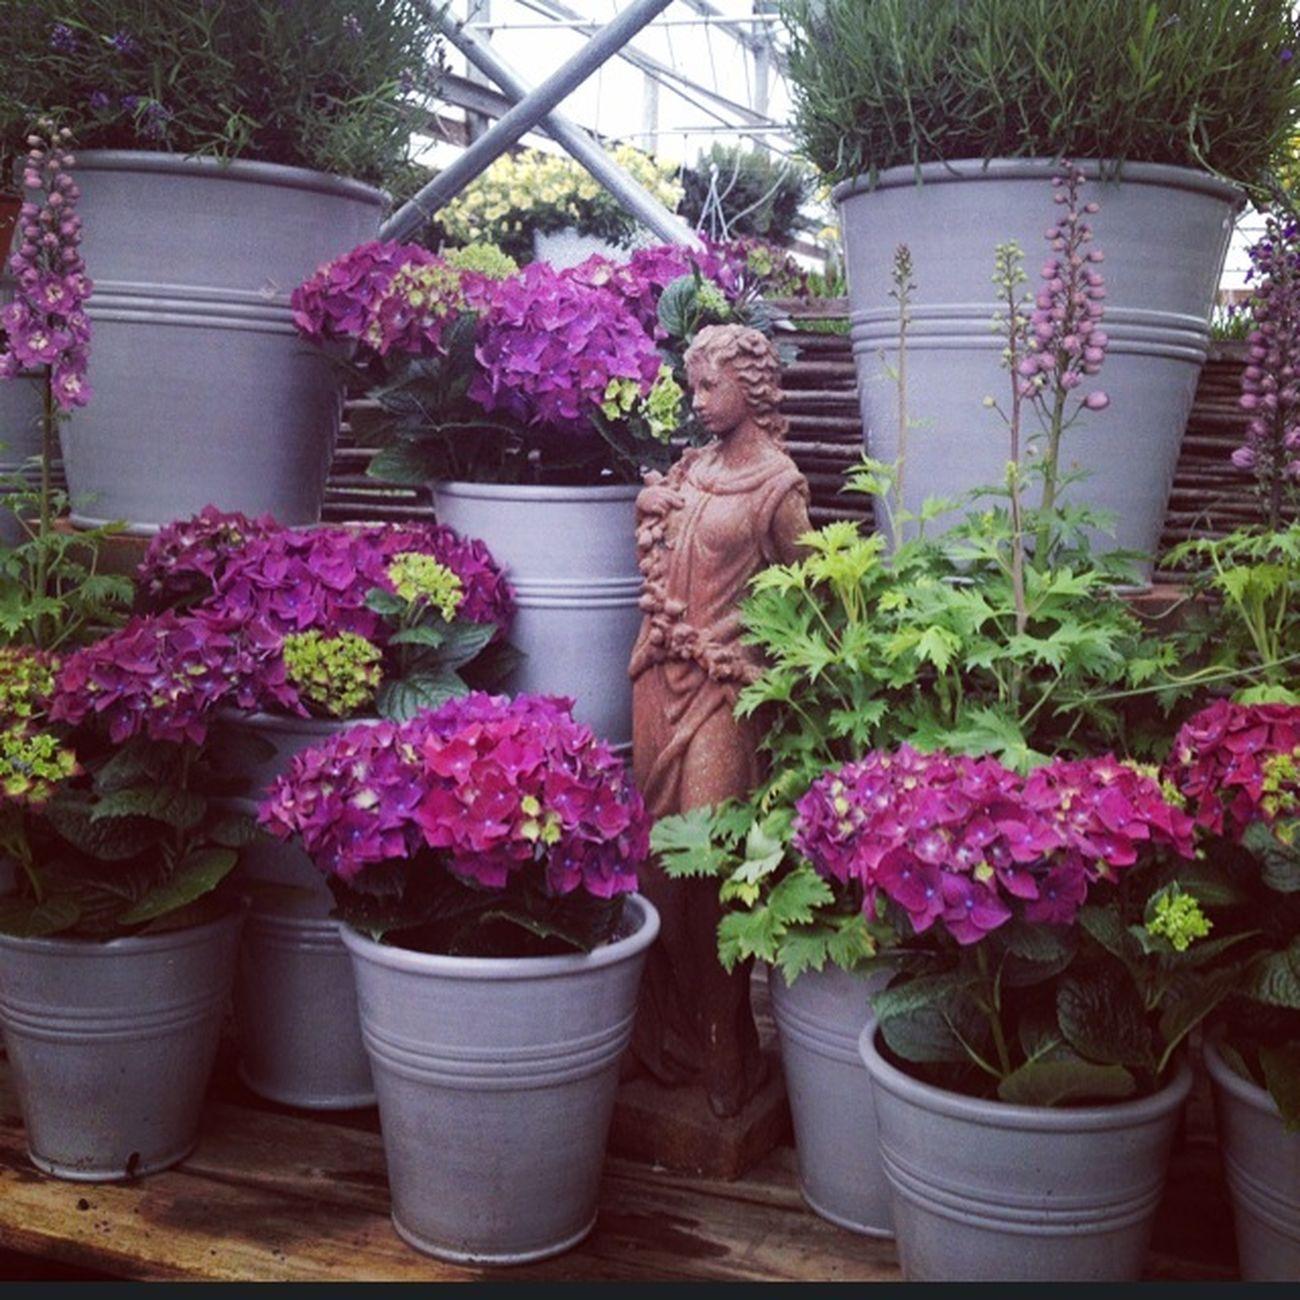 Relaxing Gardening Great Atmosphere